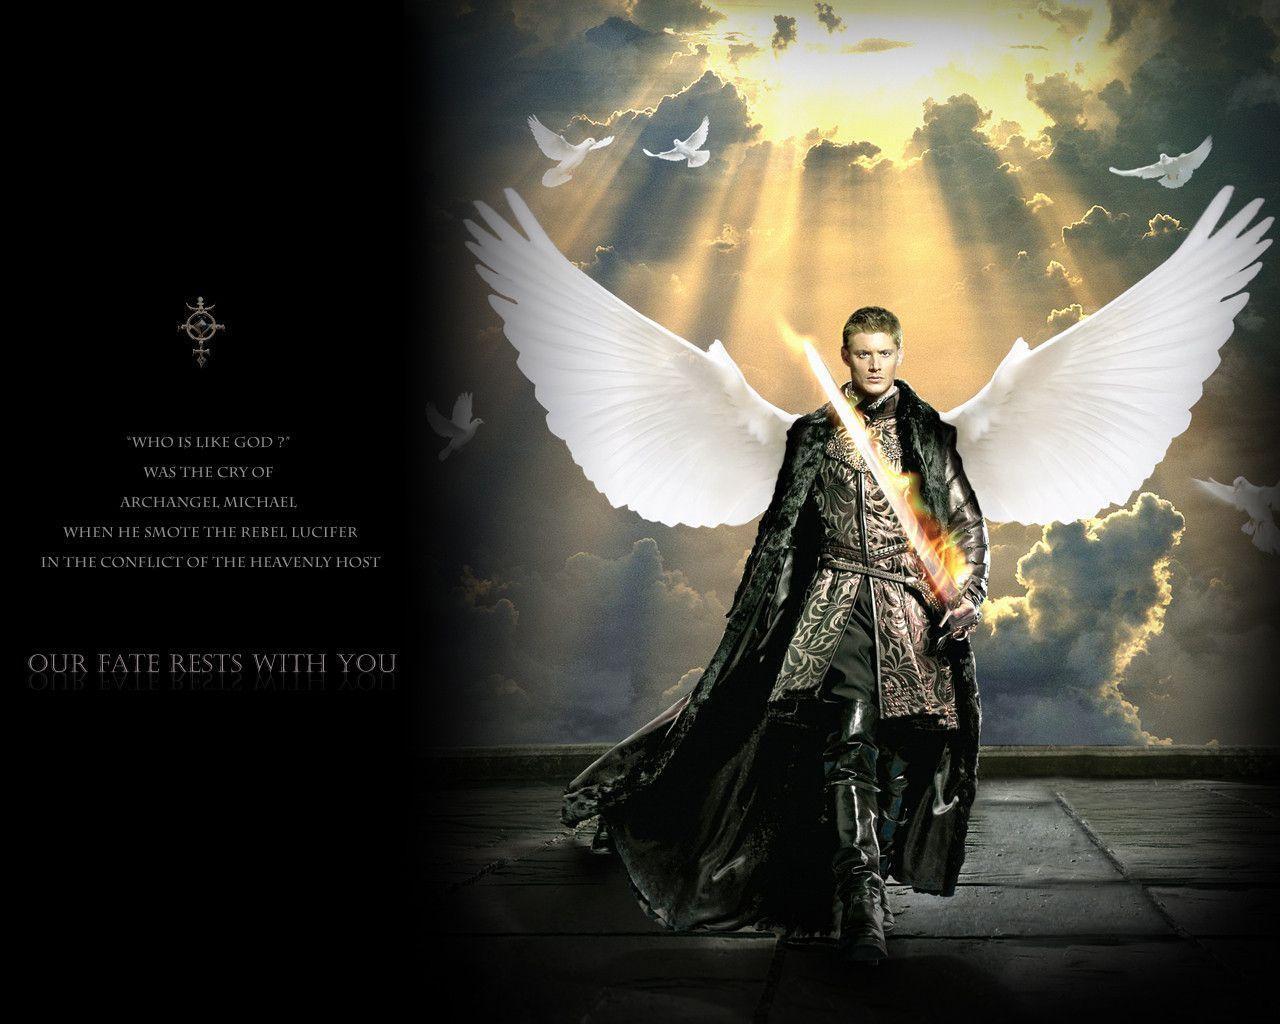 archangel michael wallpaper for computer - photo #17